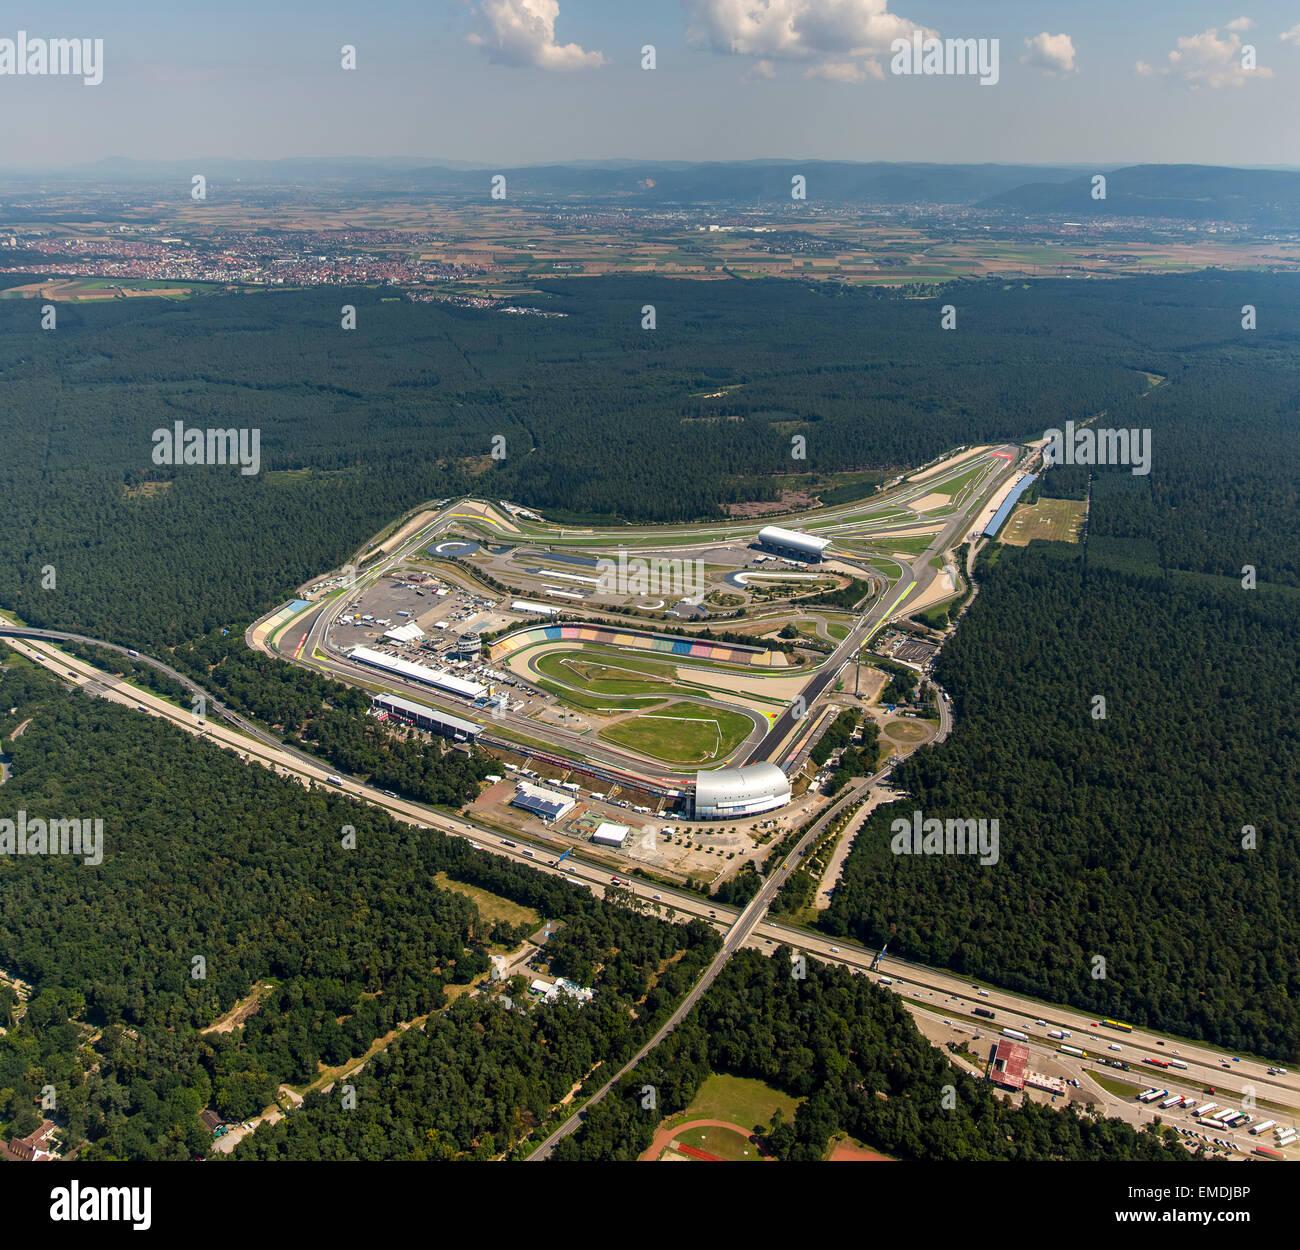 Hockenheimring, DTM motor racing circuit, Hockenheim, Baden-Württemberg, Germany - Stock Image